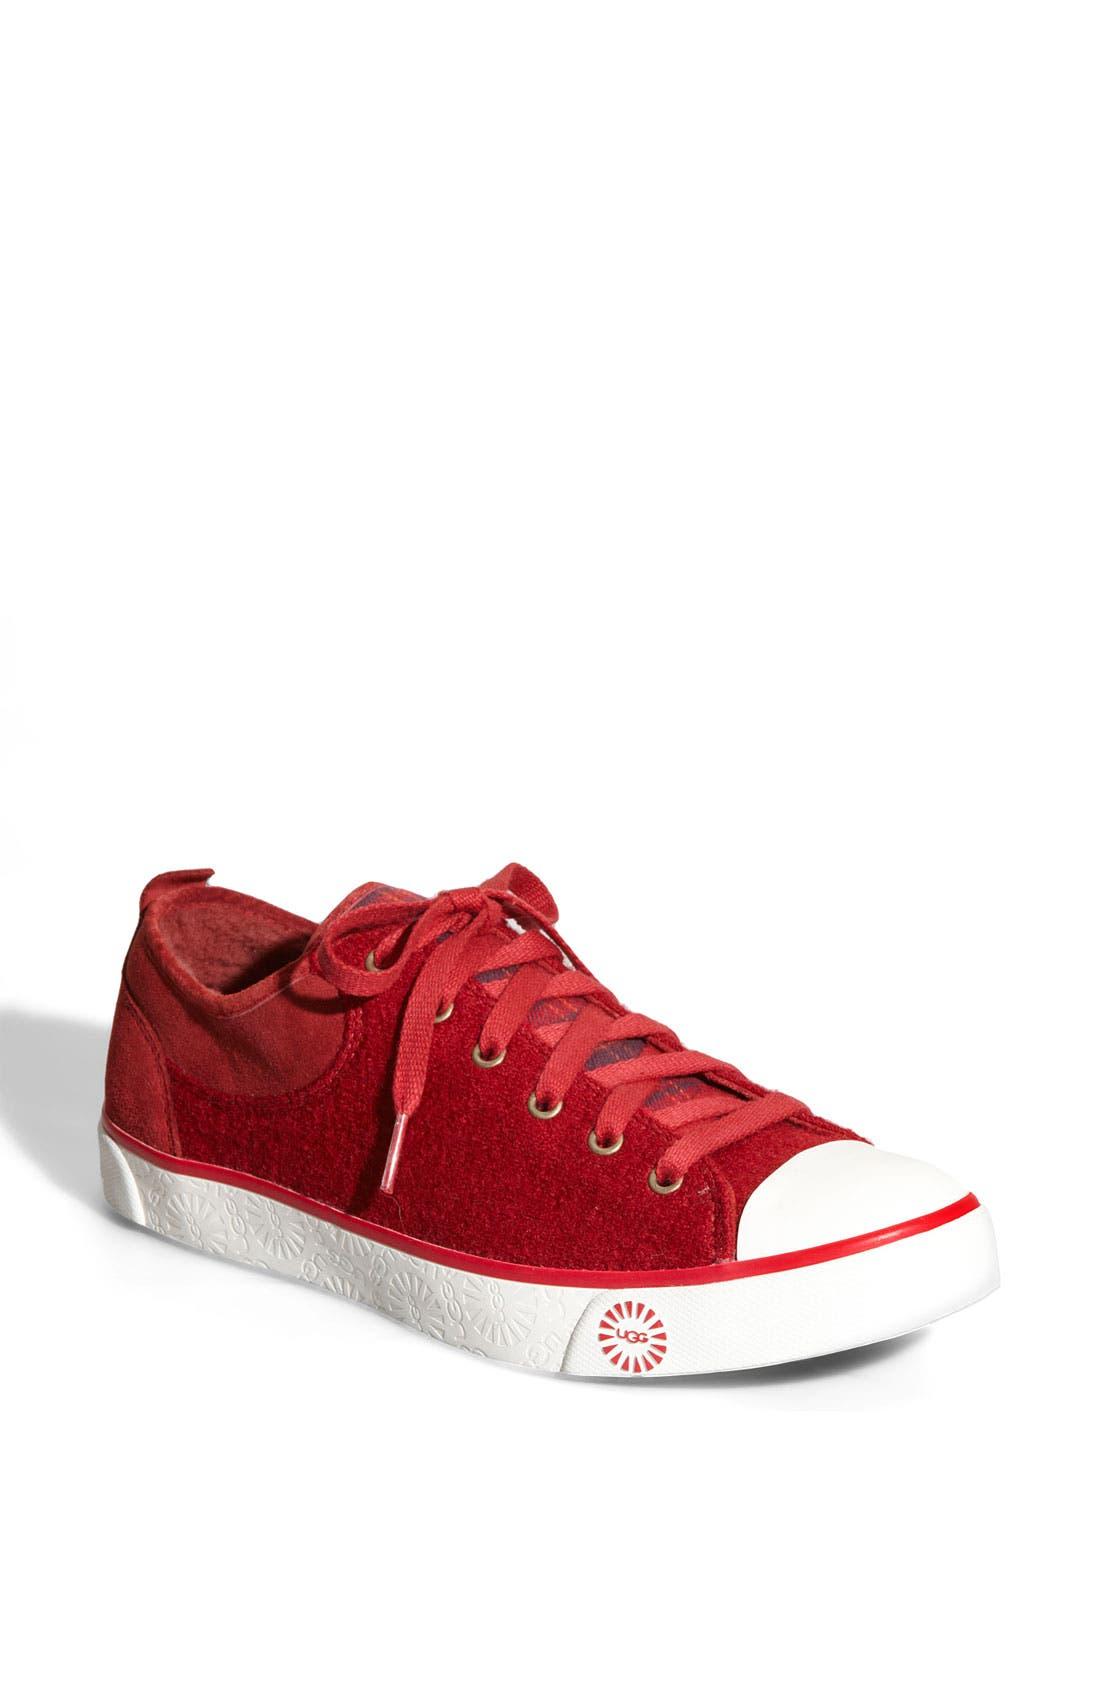 Australia 'Evera' Suede Sneaker,                         Main,                         color, 003